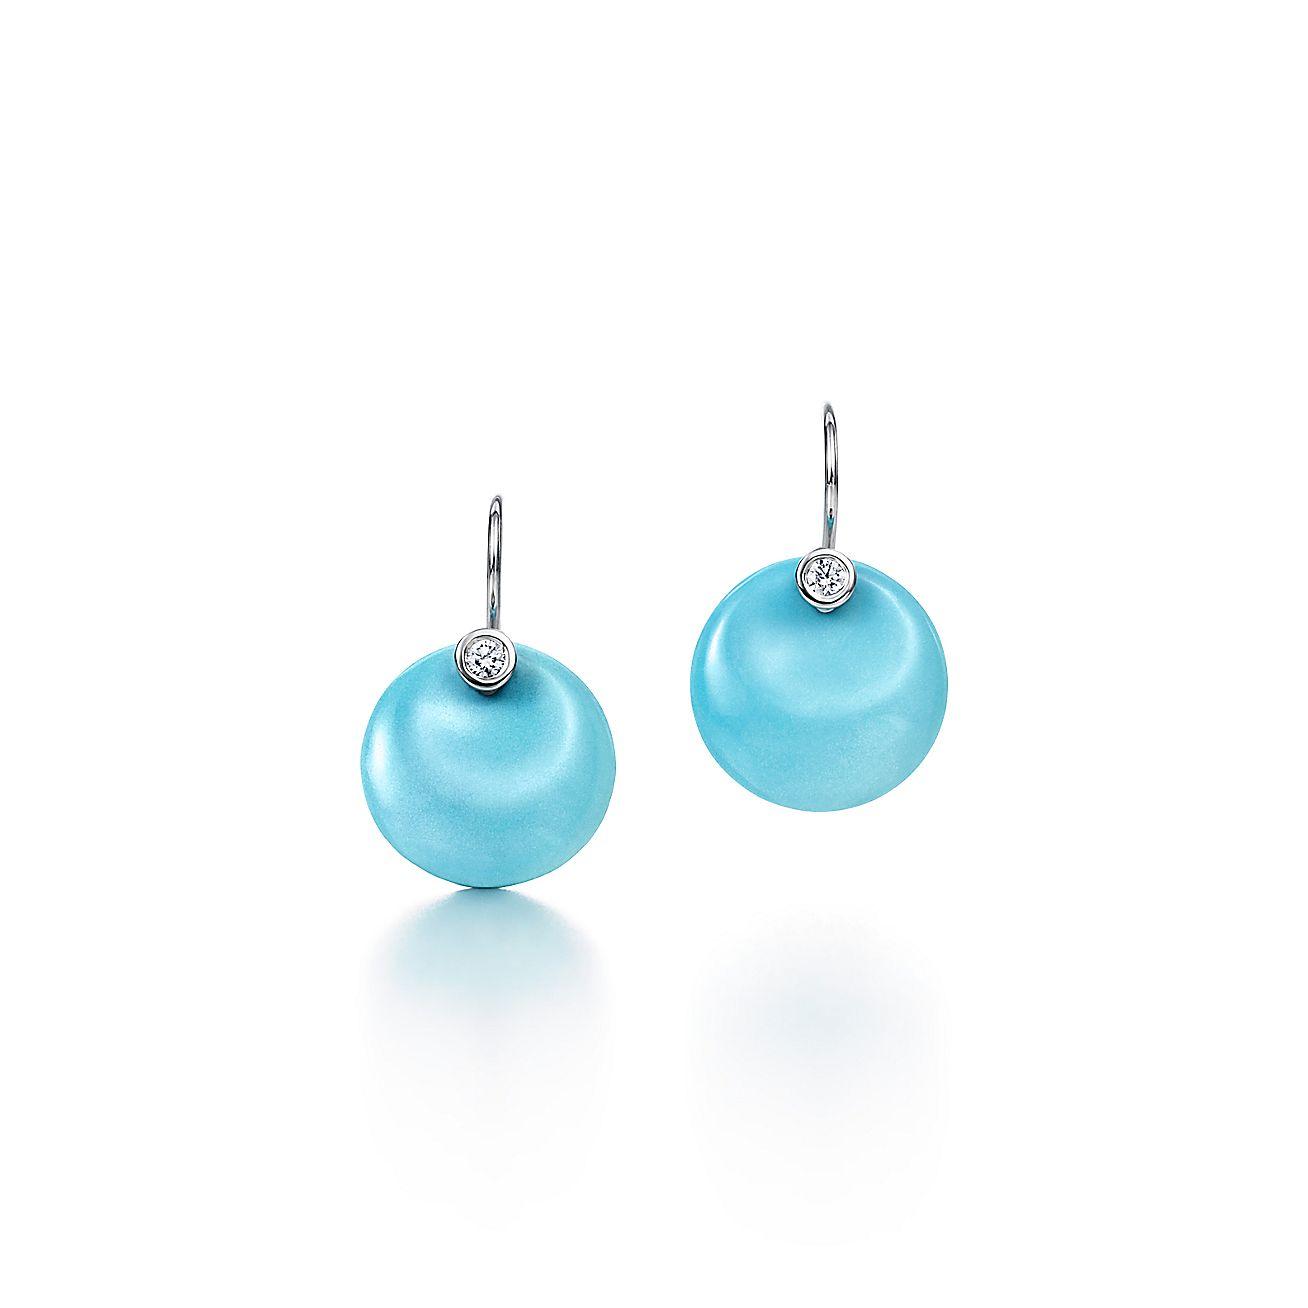 Elsa Peretti®<br>Round earrings